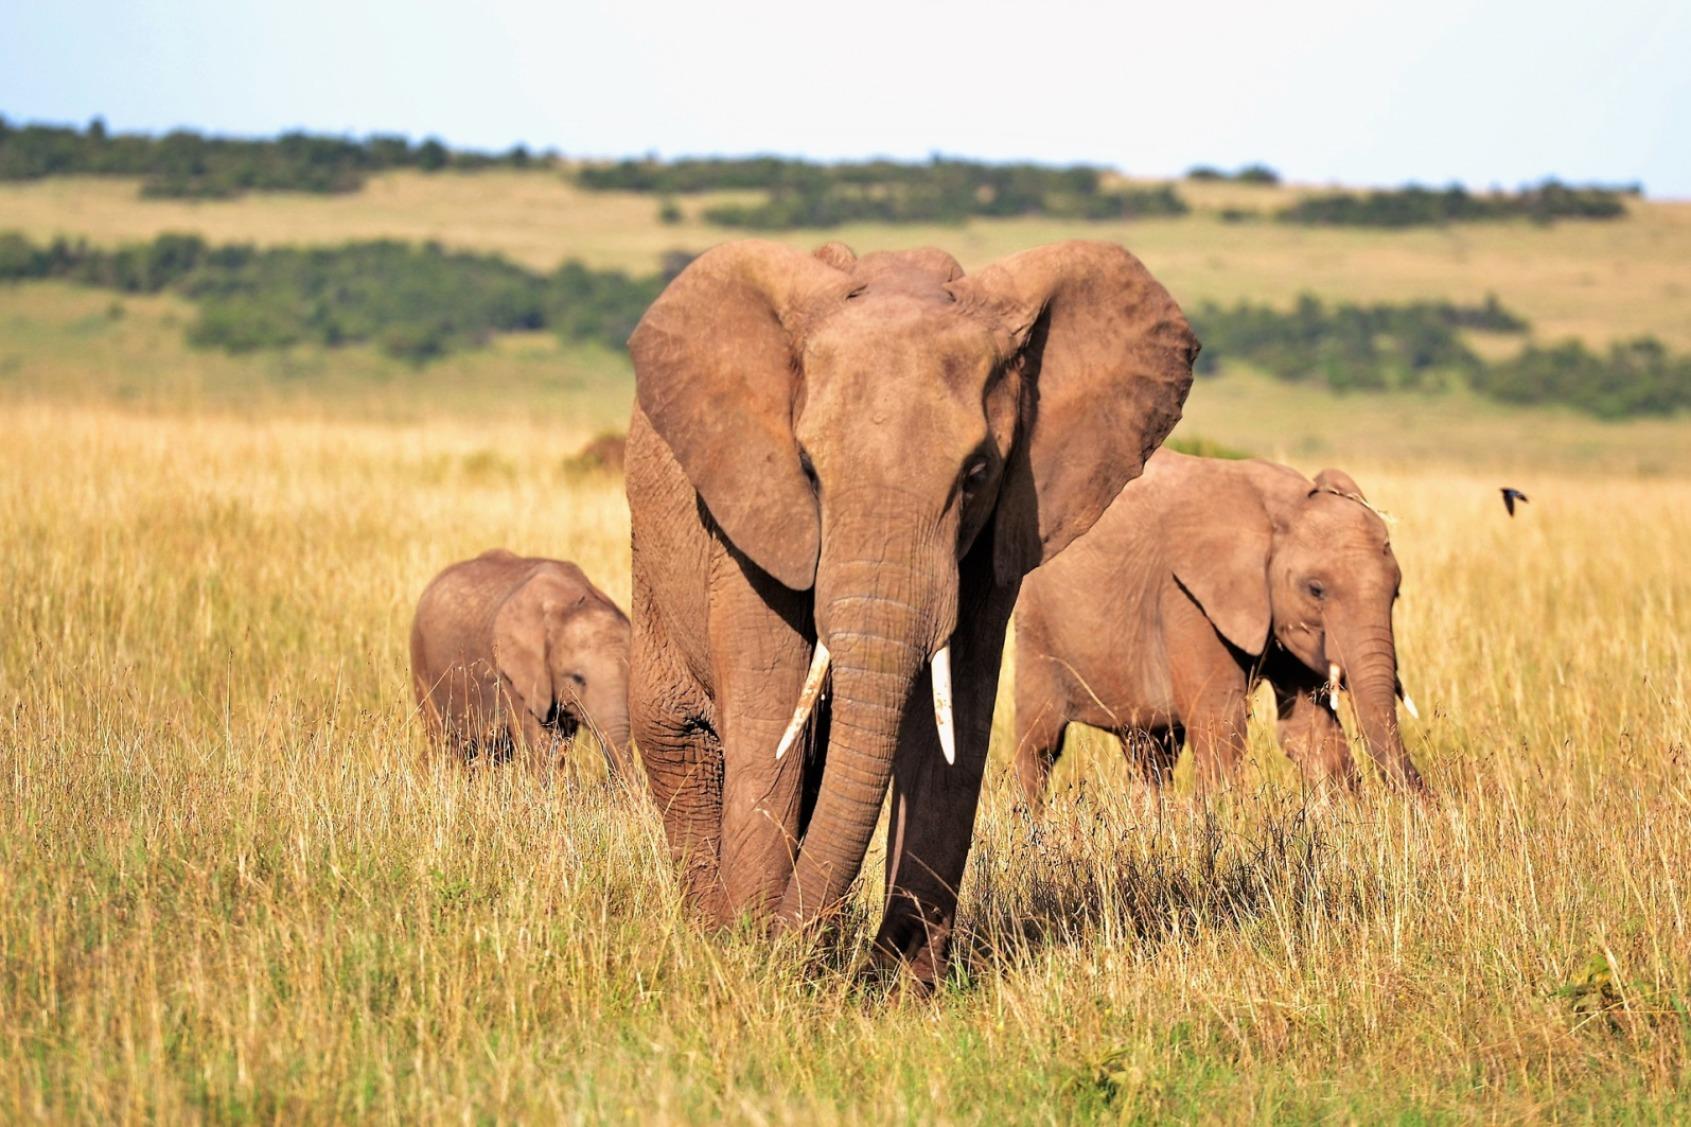 Elephants in Savanna - Original image